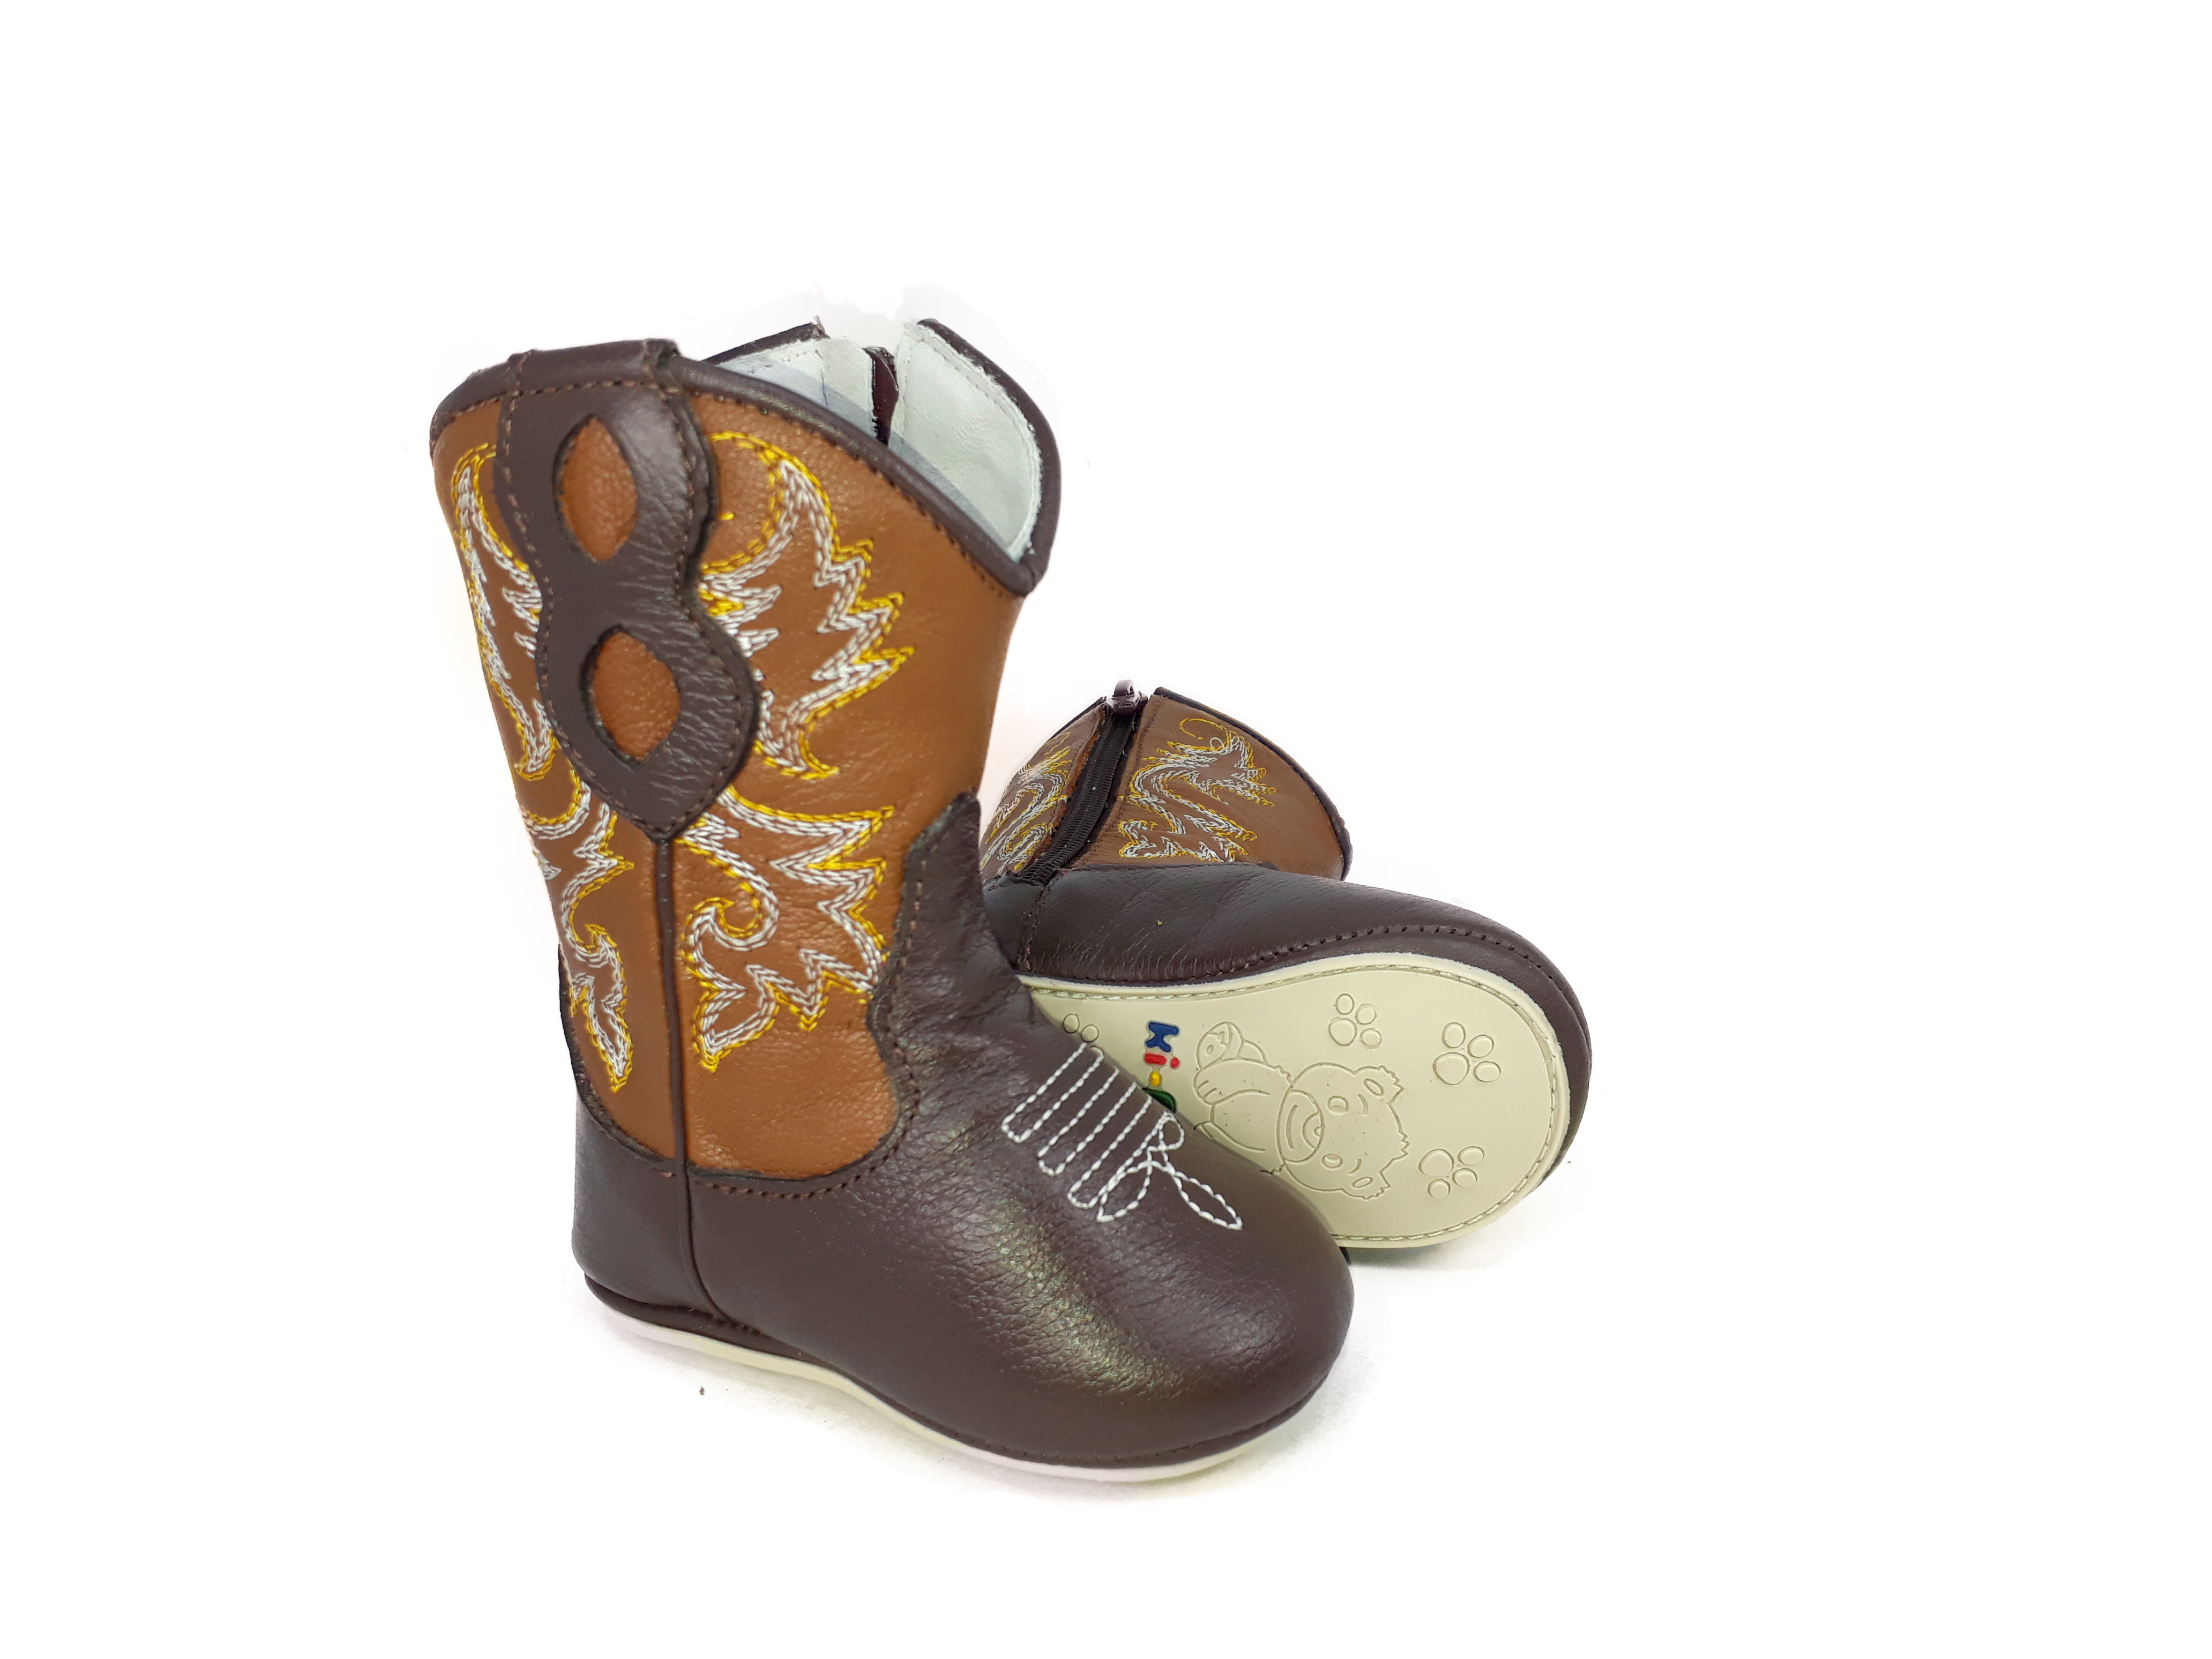 81903ff5da80d Bota Country de Bebê Texana Menina Rodeio Cowboy 1830 no Elo7